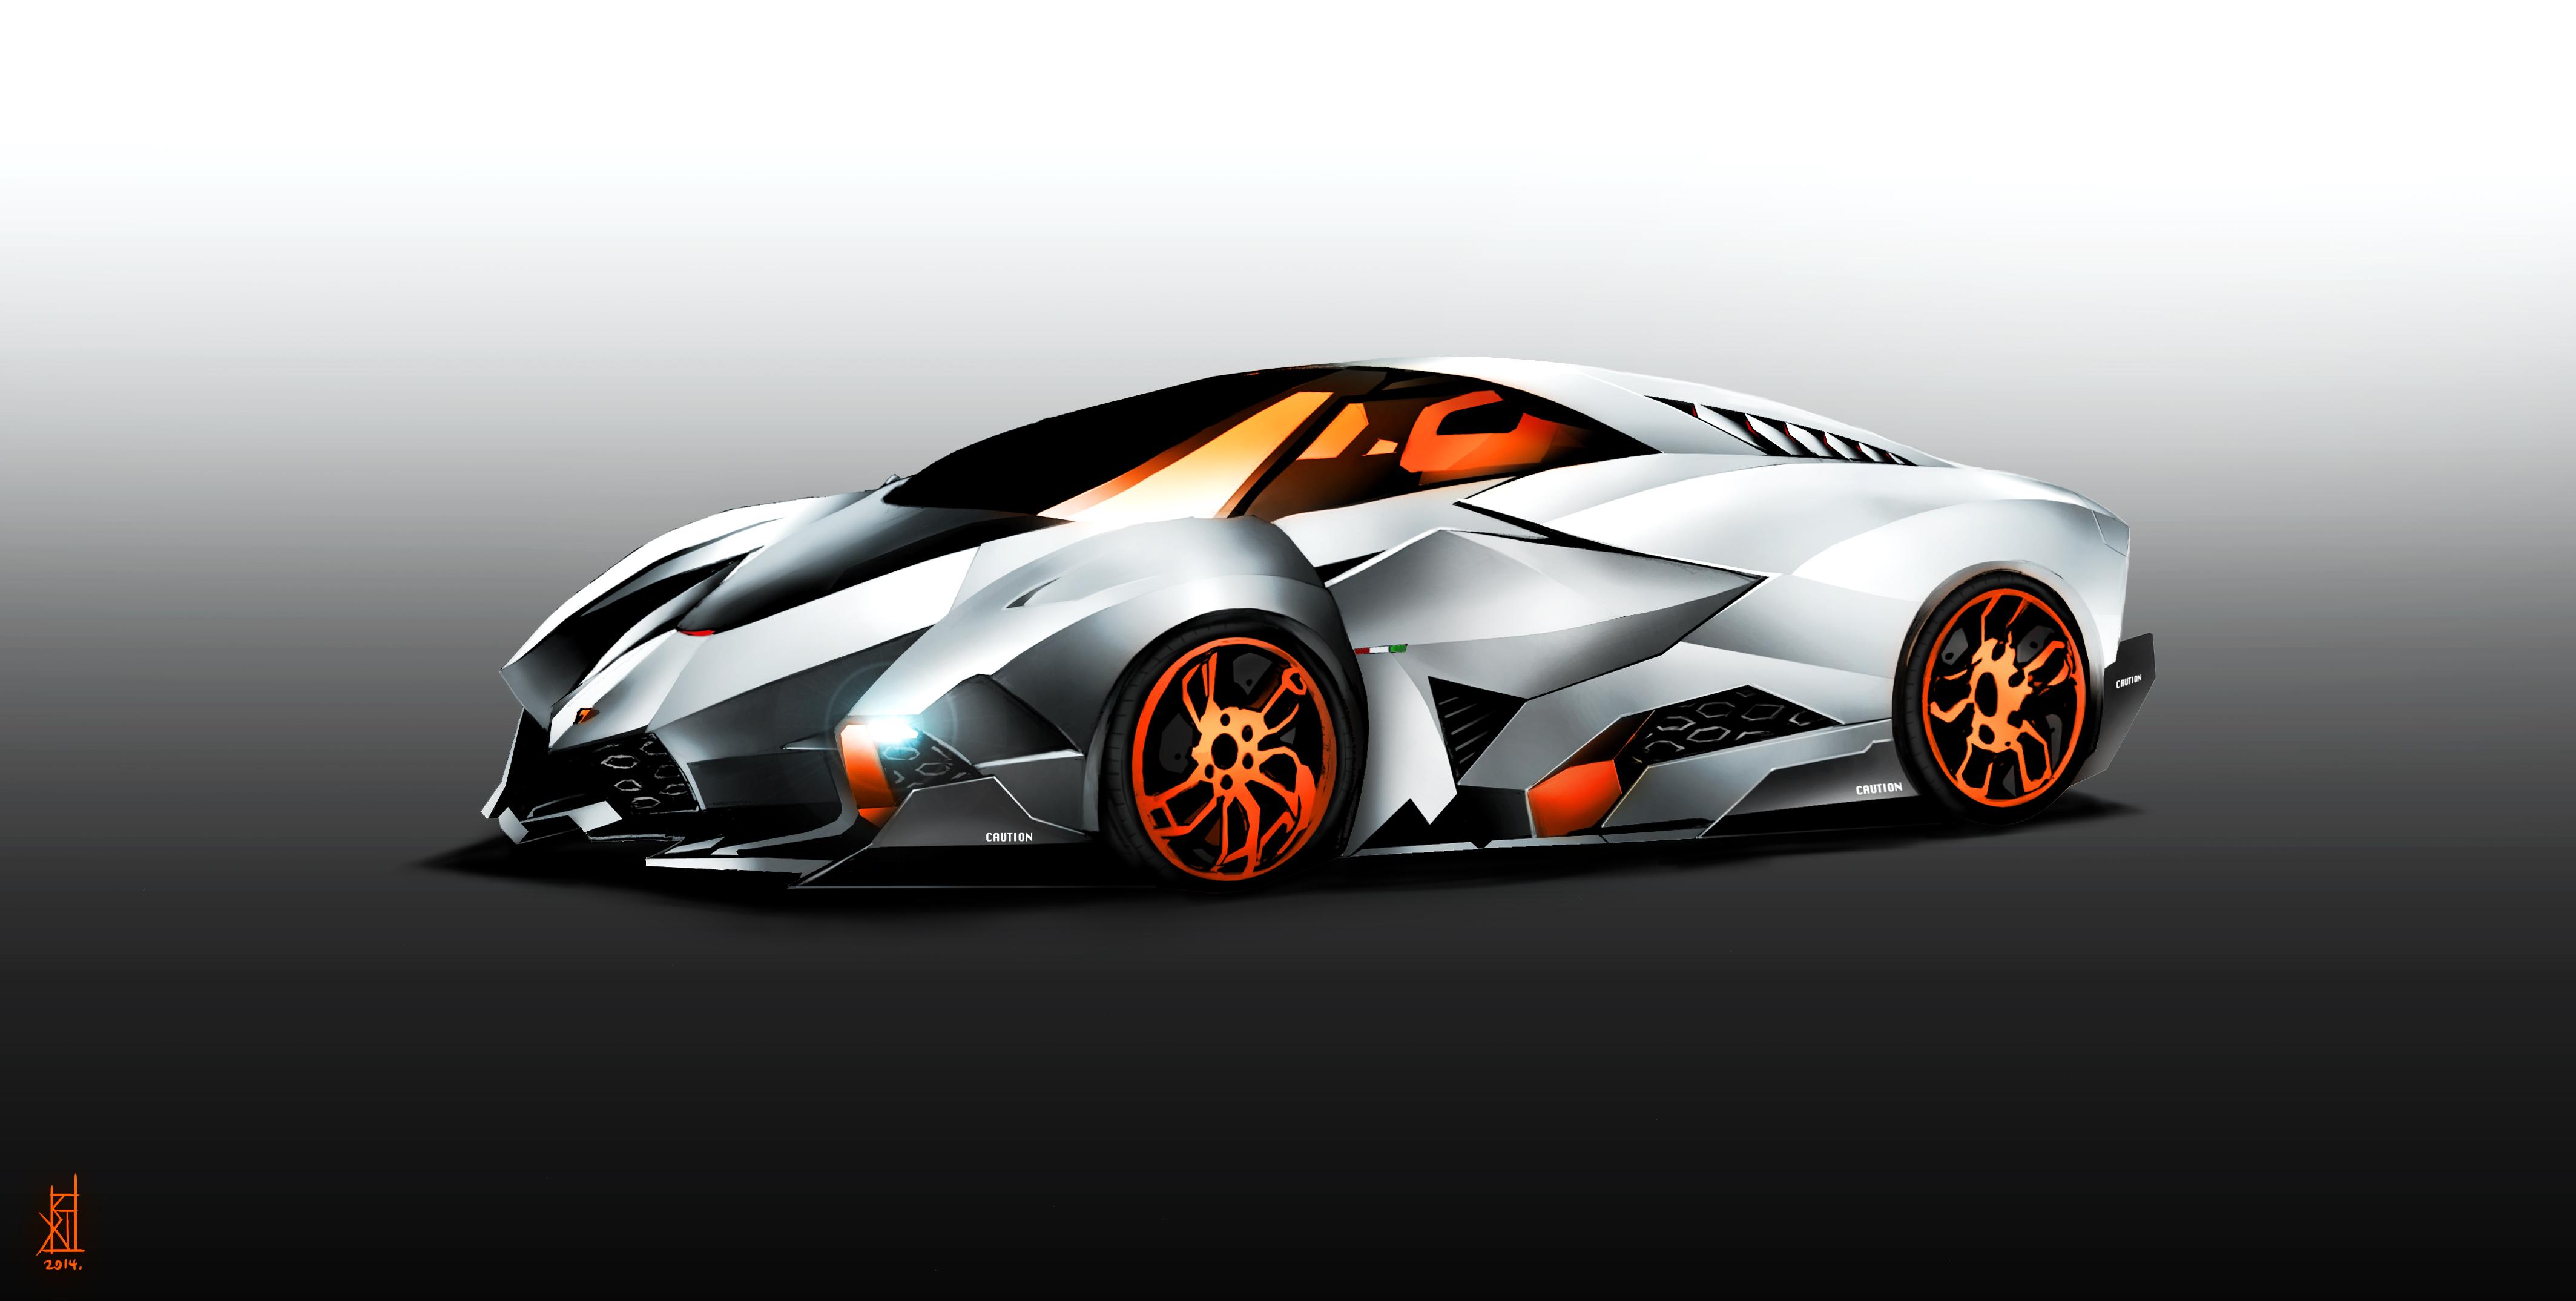 Lamborghini Egoista By Therisingsoul On Deviantart